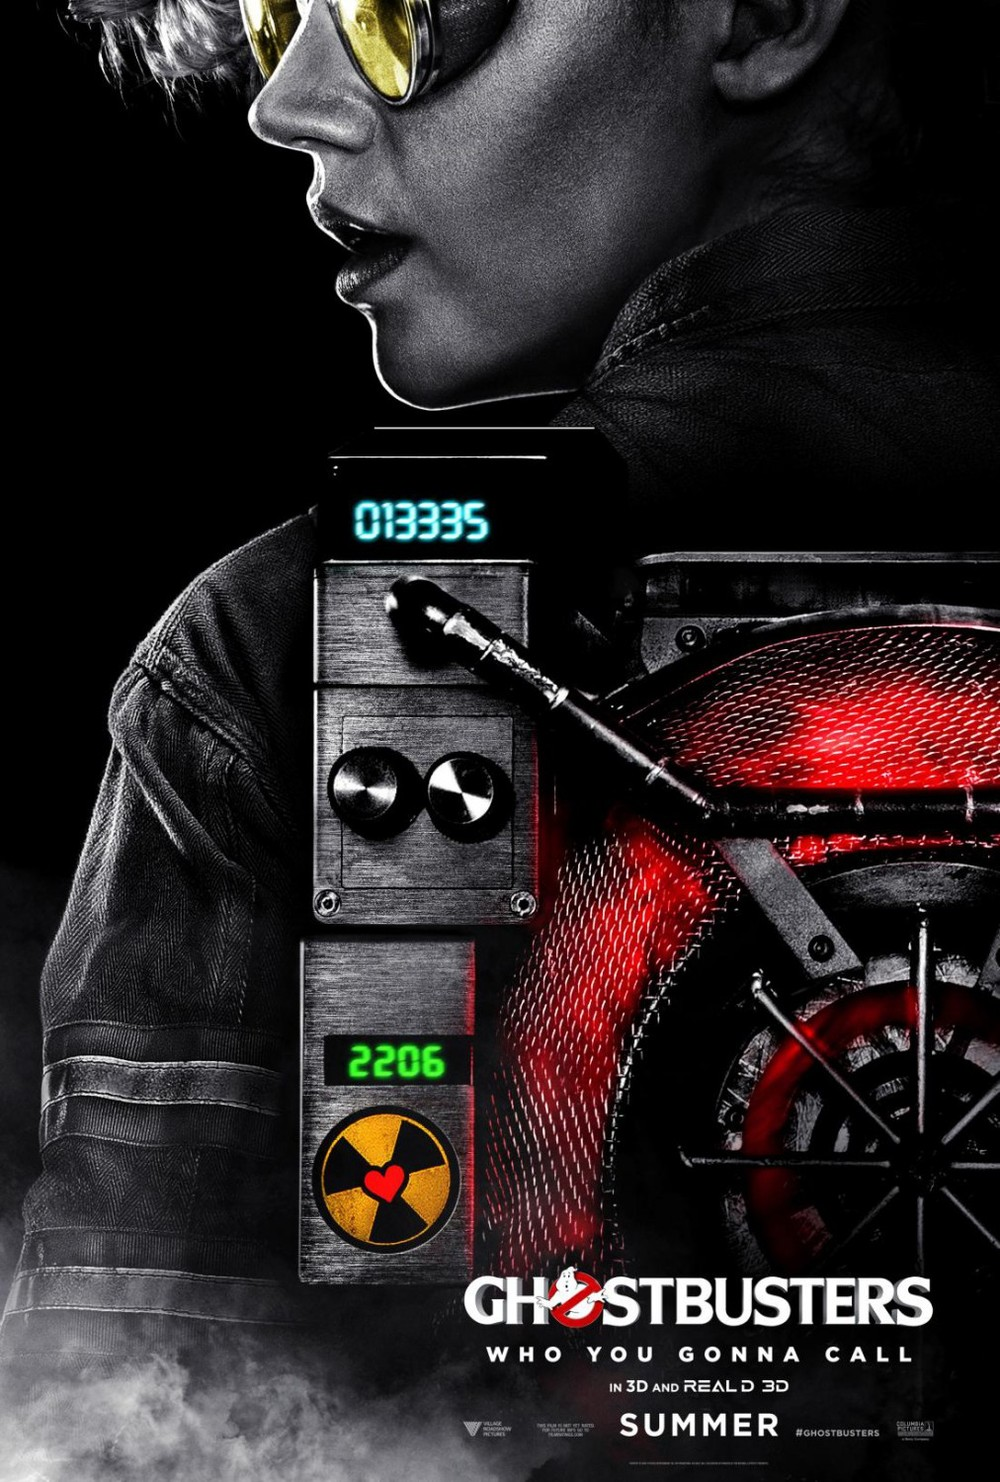 Itunes movie release dates in Perth